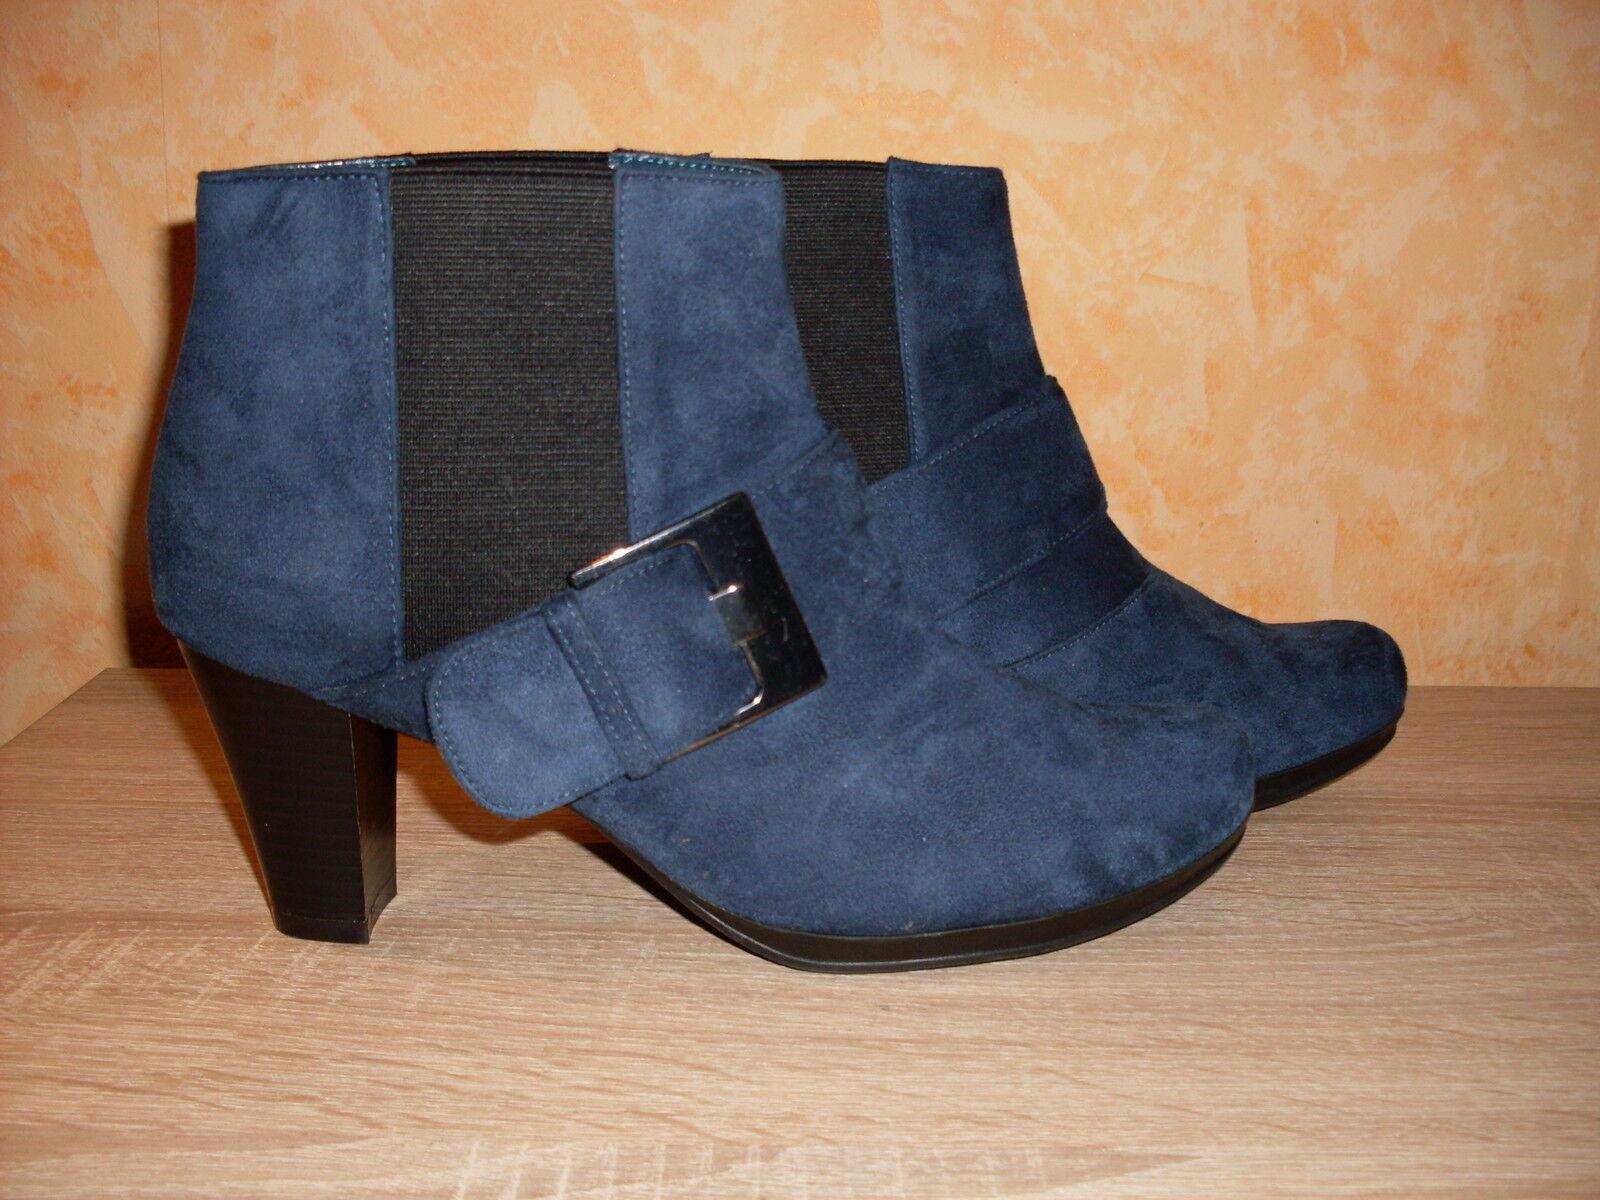 Designer Schlupf Stiefelette Andrea Conti NEU Gr. 7 41 in blau & Velours wow